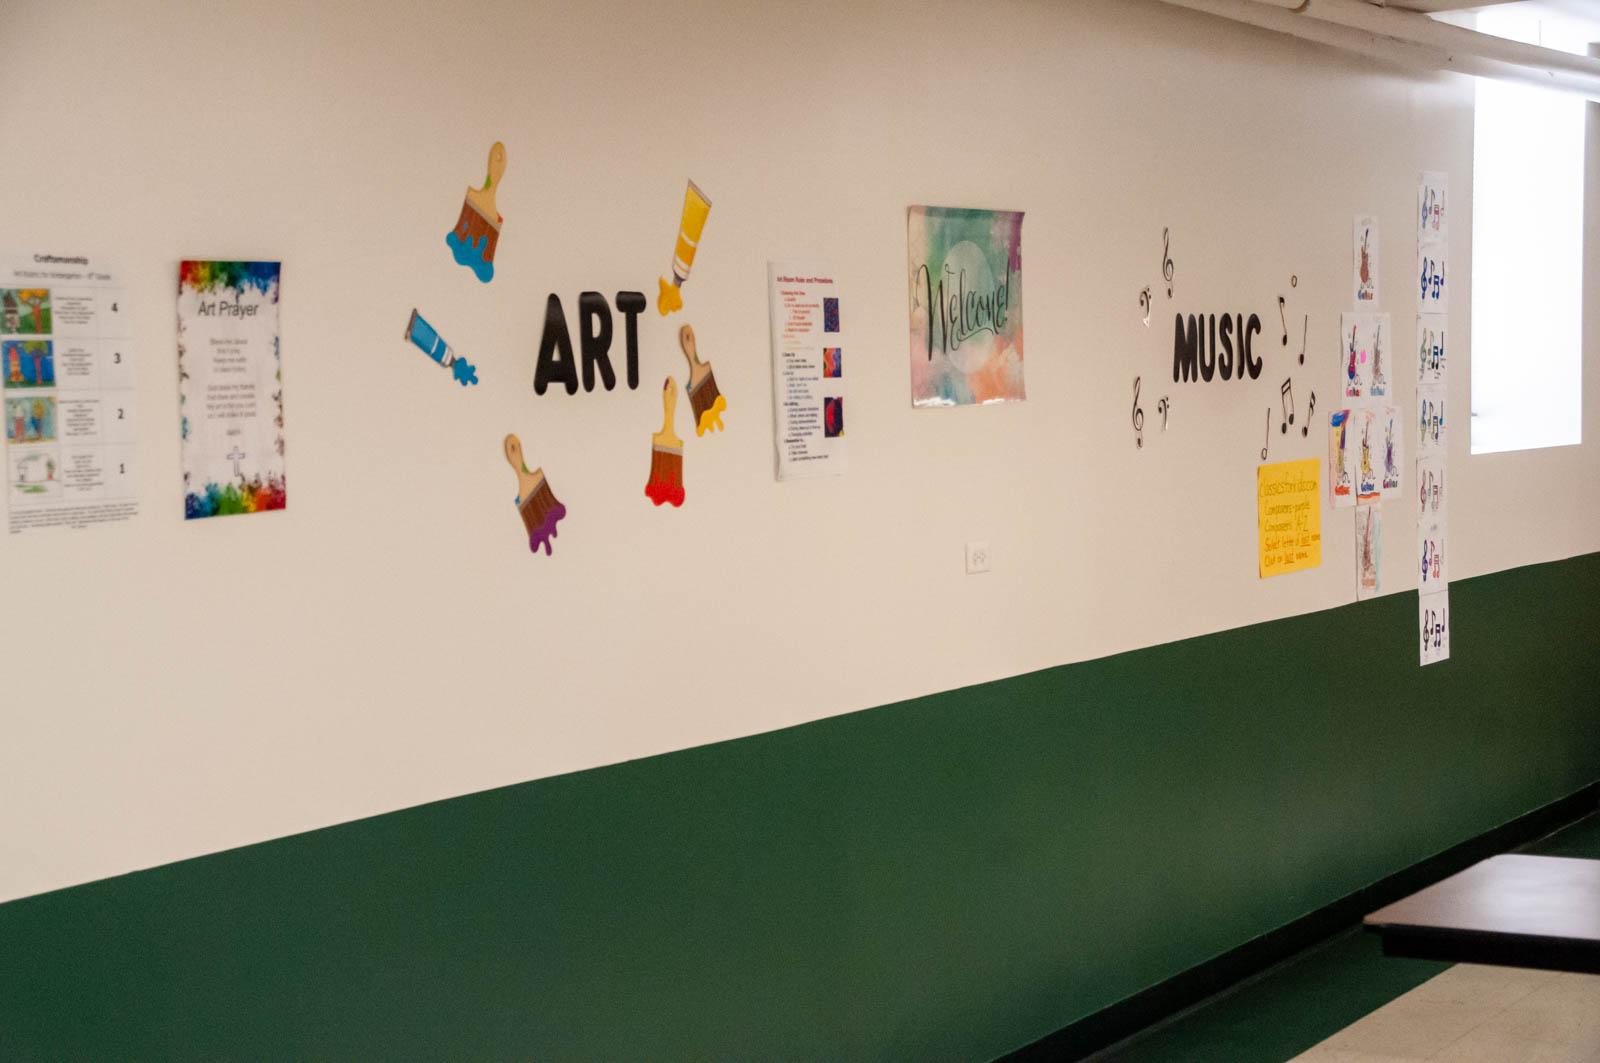 Art-Music-Hallway